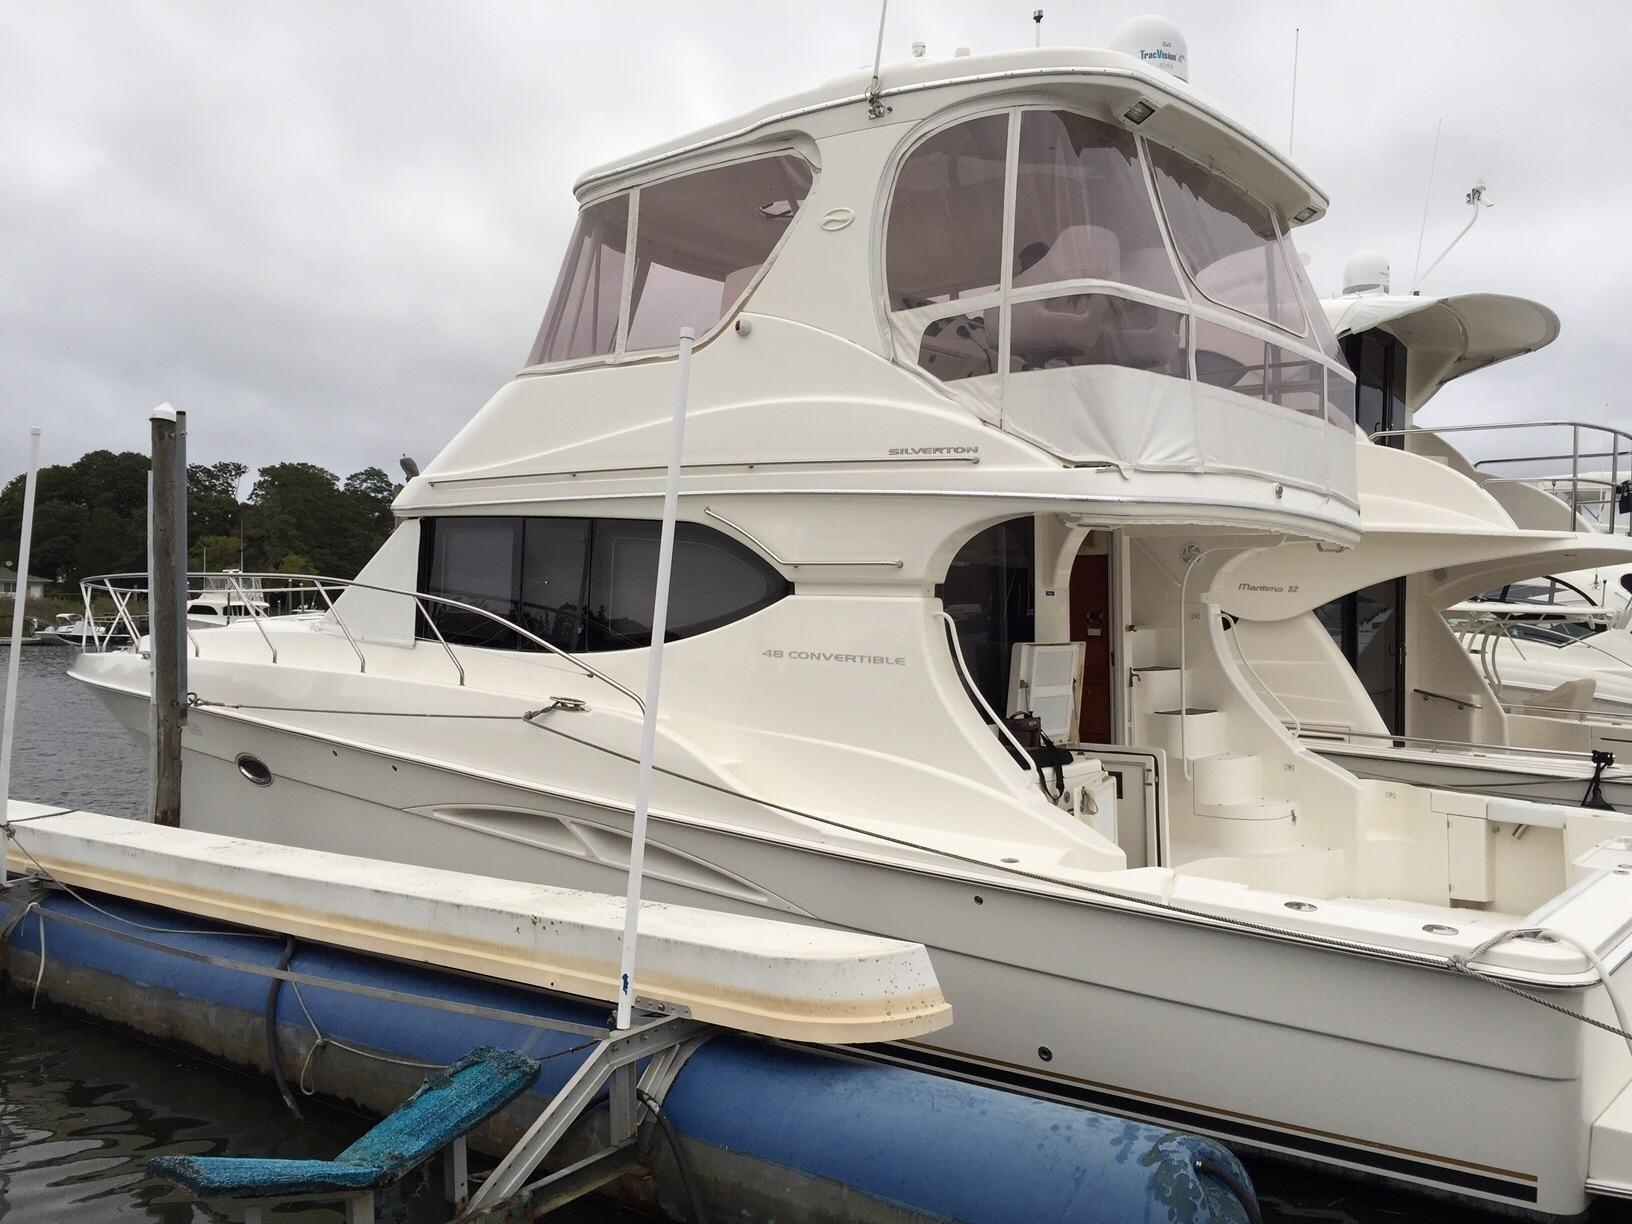 2004 Silverton 48 Convertible Power Boat For Sale - www ...